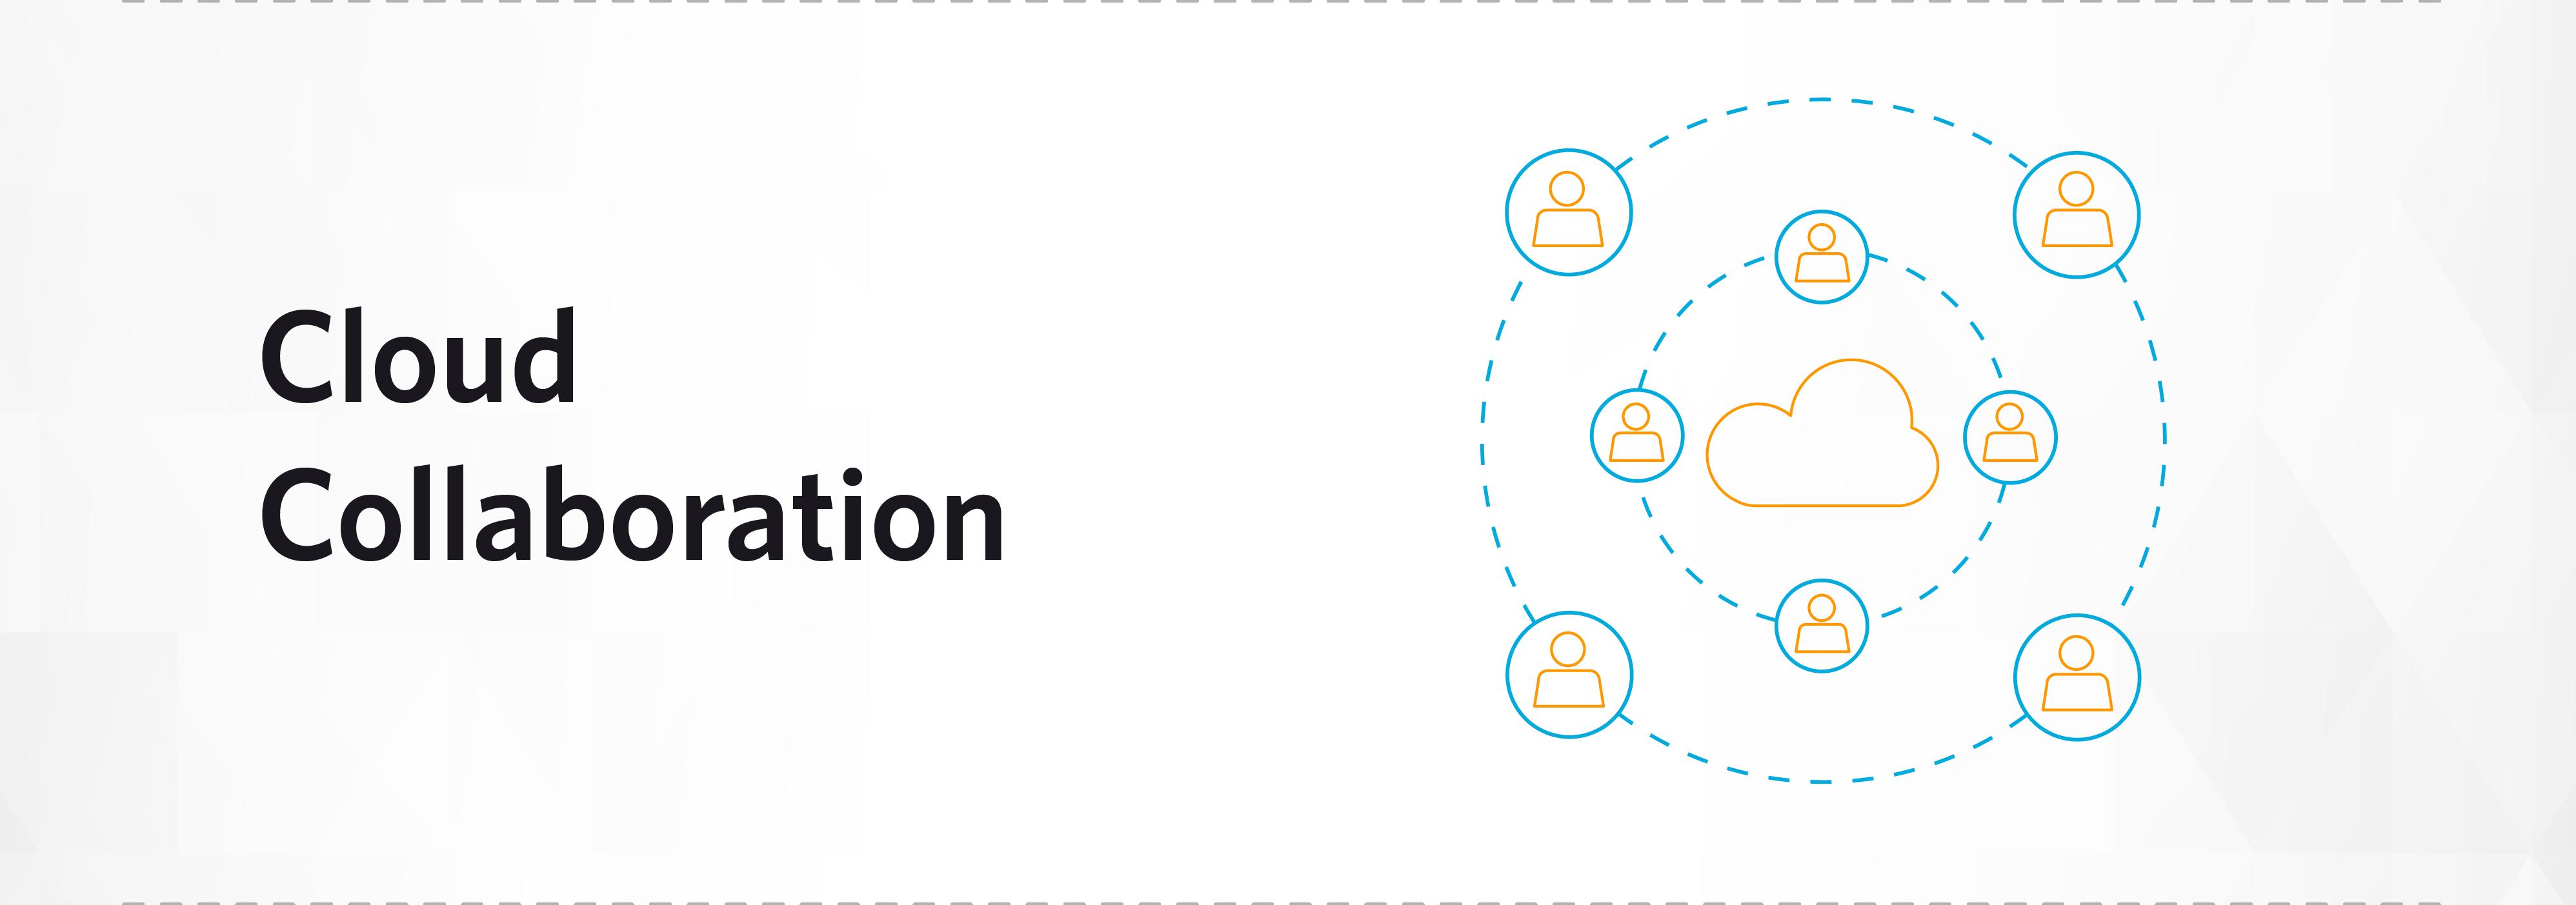 Blog Image_Cloud Collaboration Box